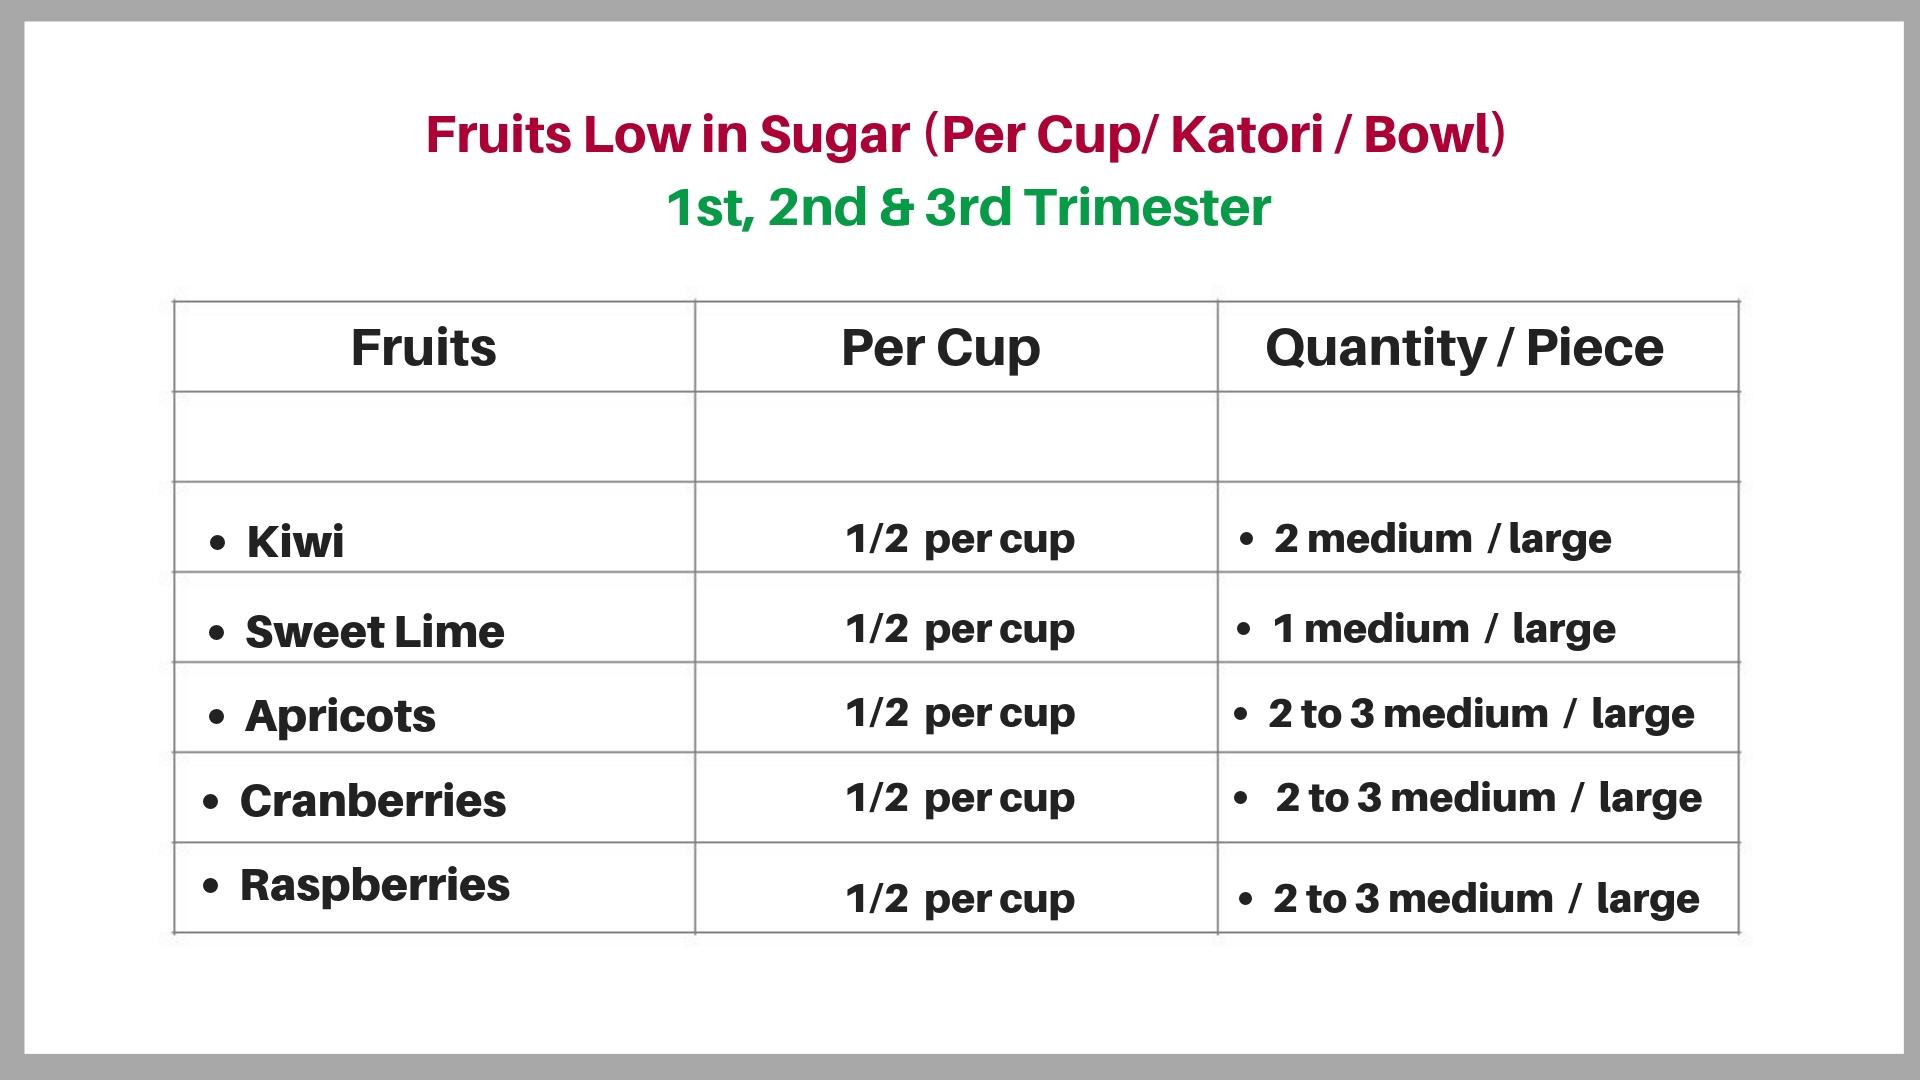 Fruits Low in Sugar During Pregnancyby Shweta Sharma